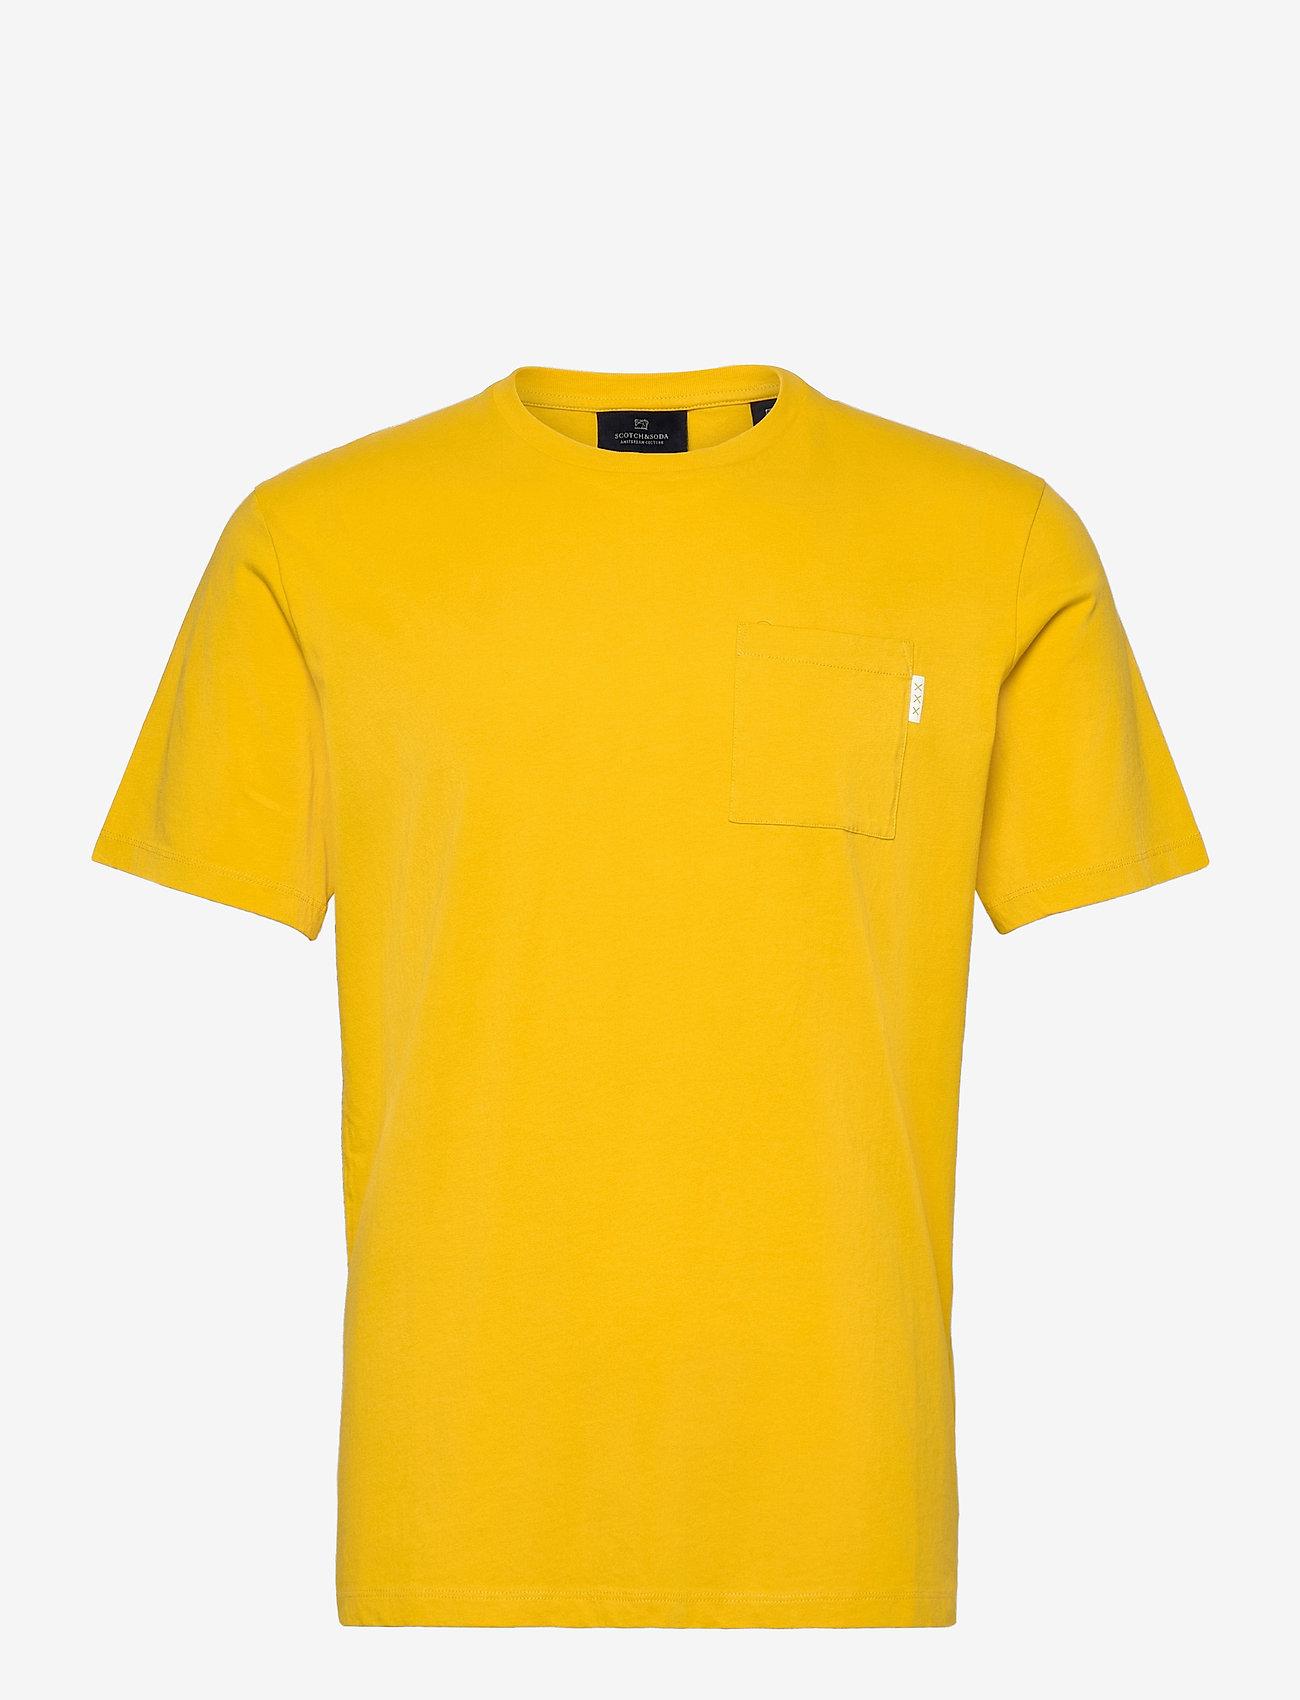 Scotch & Soda - Fabric dyed pocket tee - basic t-shirts - explorer yellow - 0